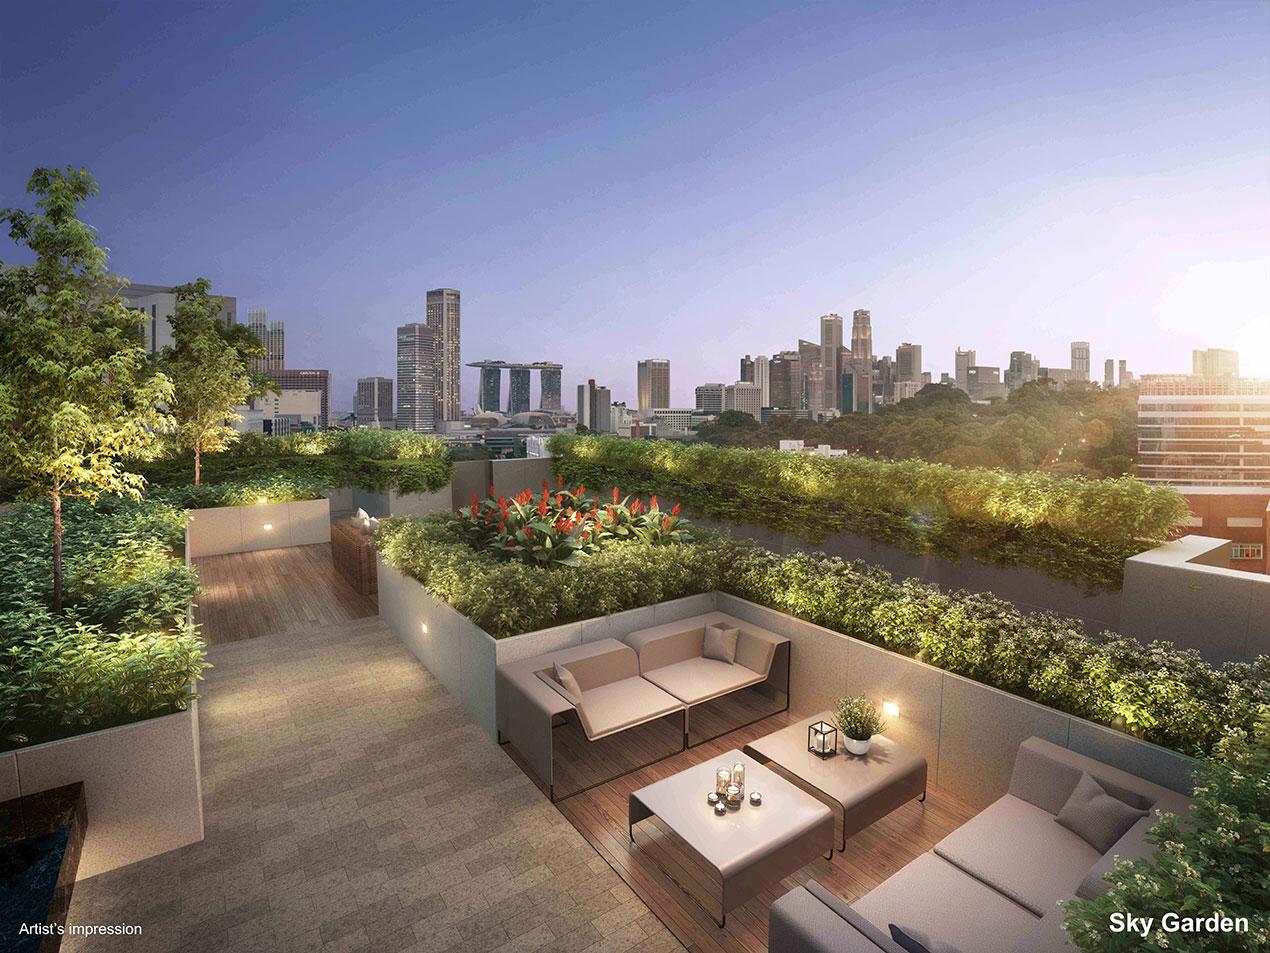 Facility_Haus_on_Handy_Perspective - Sky-Garden-w-